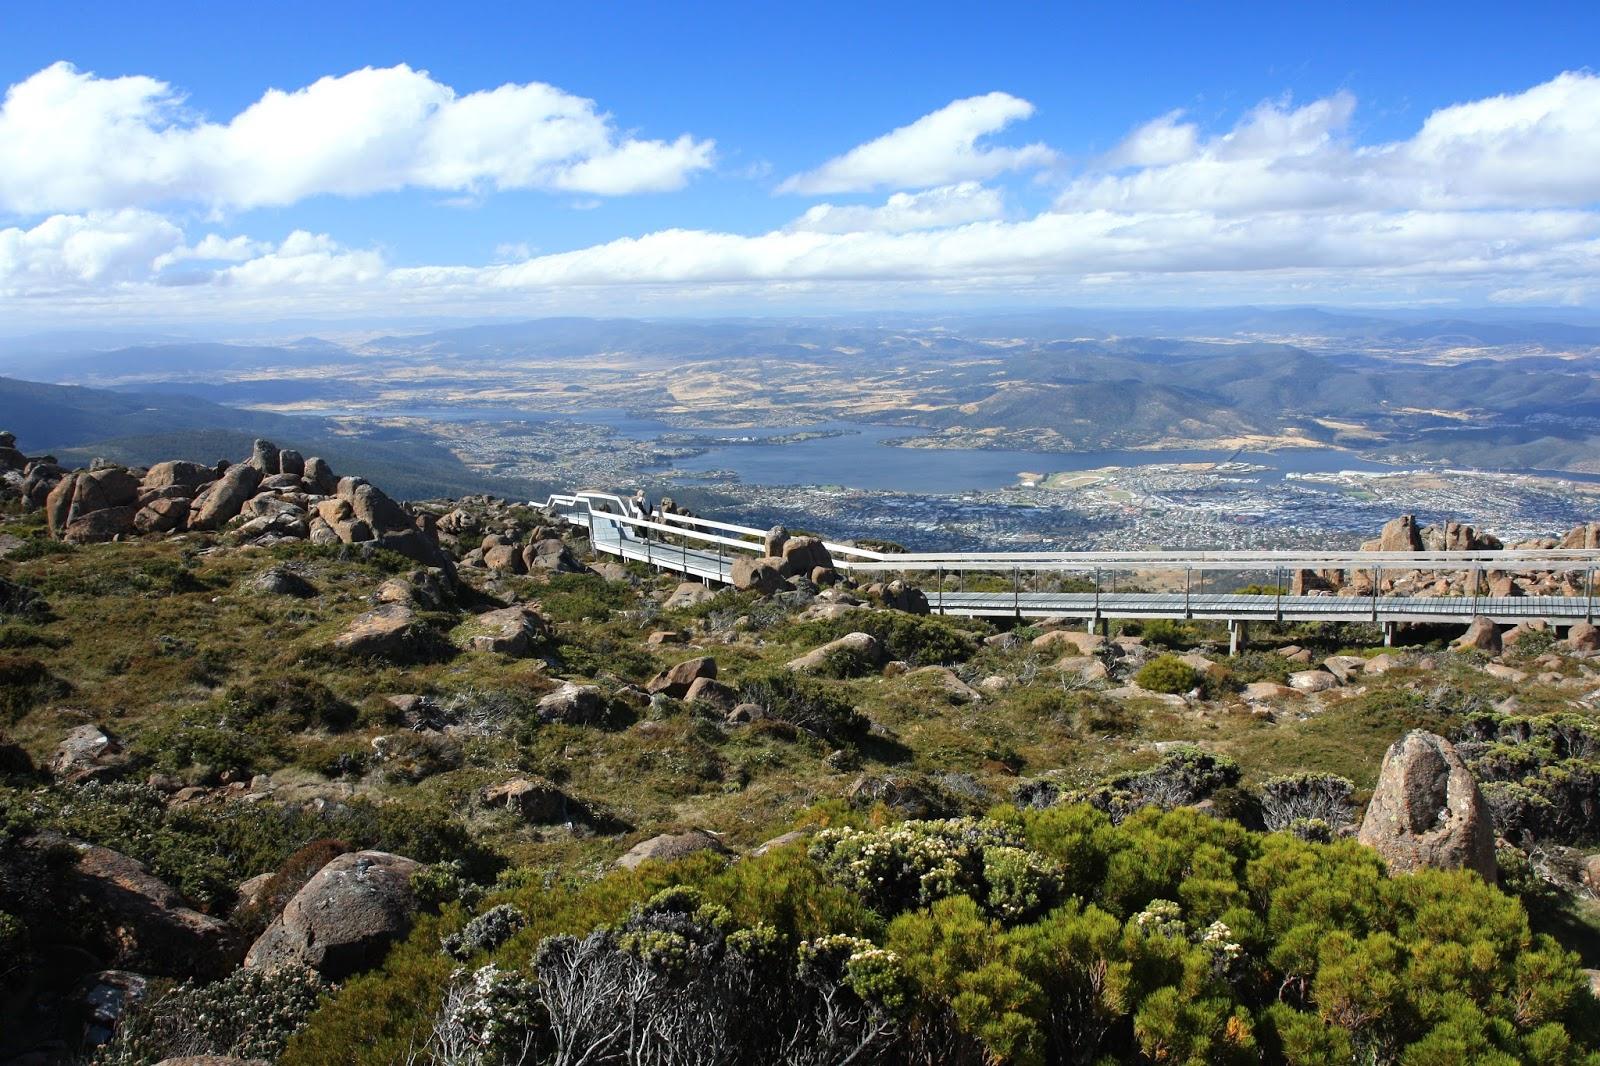 塔斯馬尼亞-威靈頓山-景點-推薦-旅遊-自由行-澳洲-Tasmania-Hobart-Mount-Wellington-Tourist-Attraction-Australia